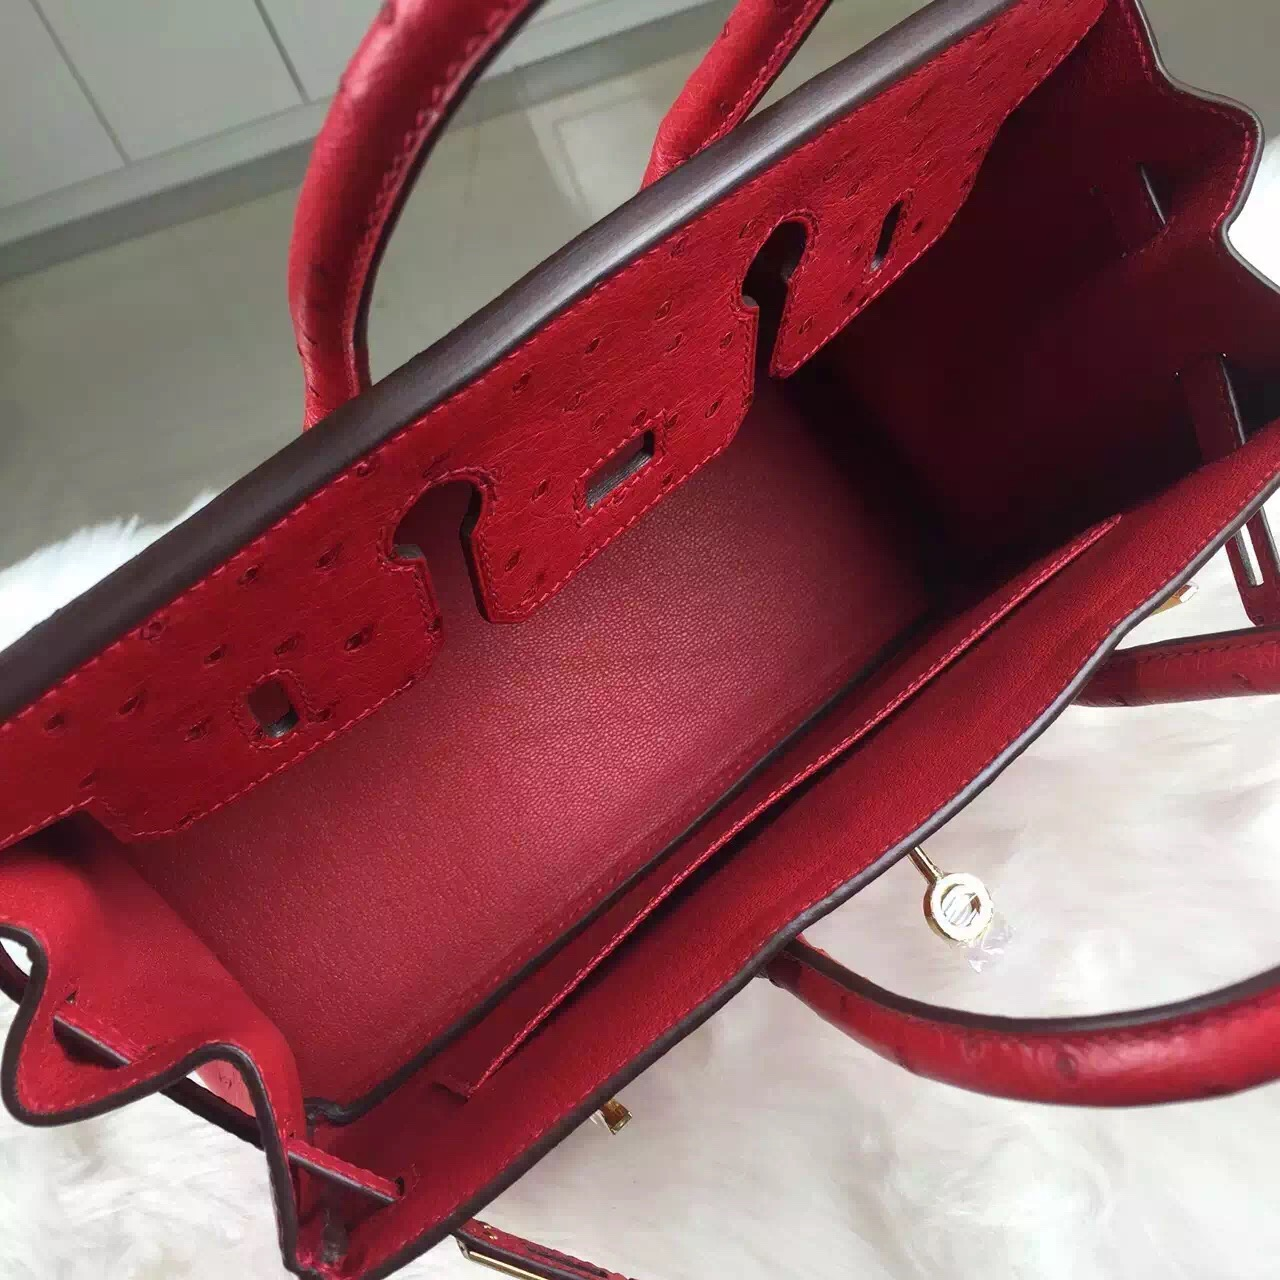 Hand Stitching Hermes Red Ostrich Leather Birkin Bag 25CM Luxury Women's Tote Bag